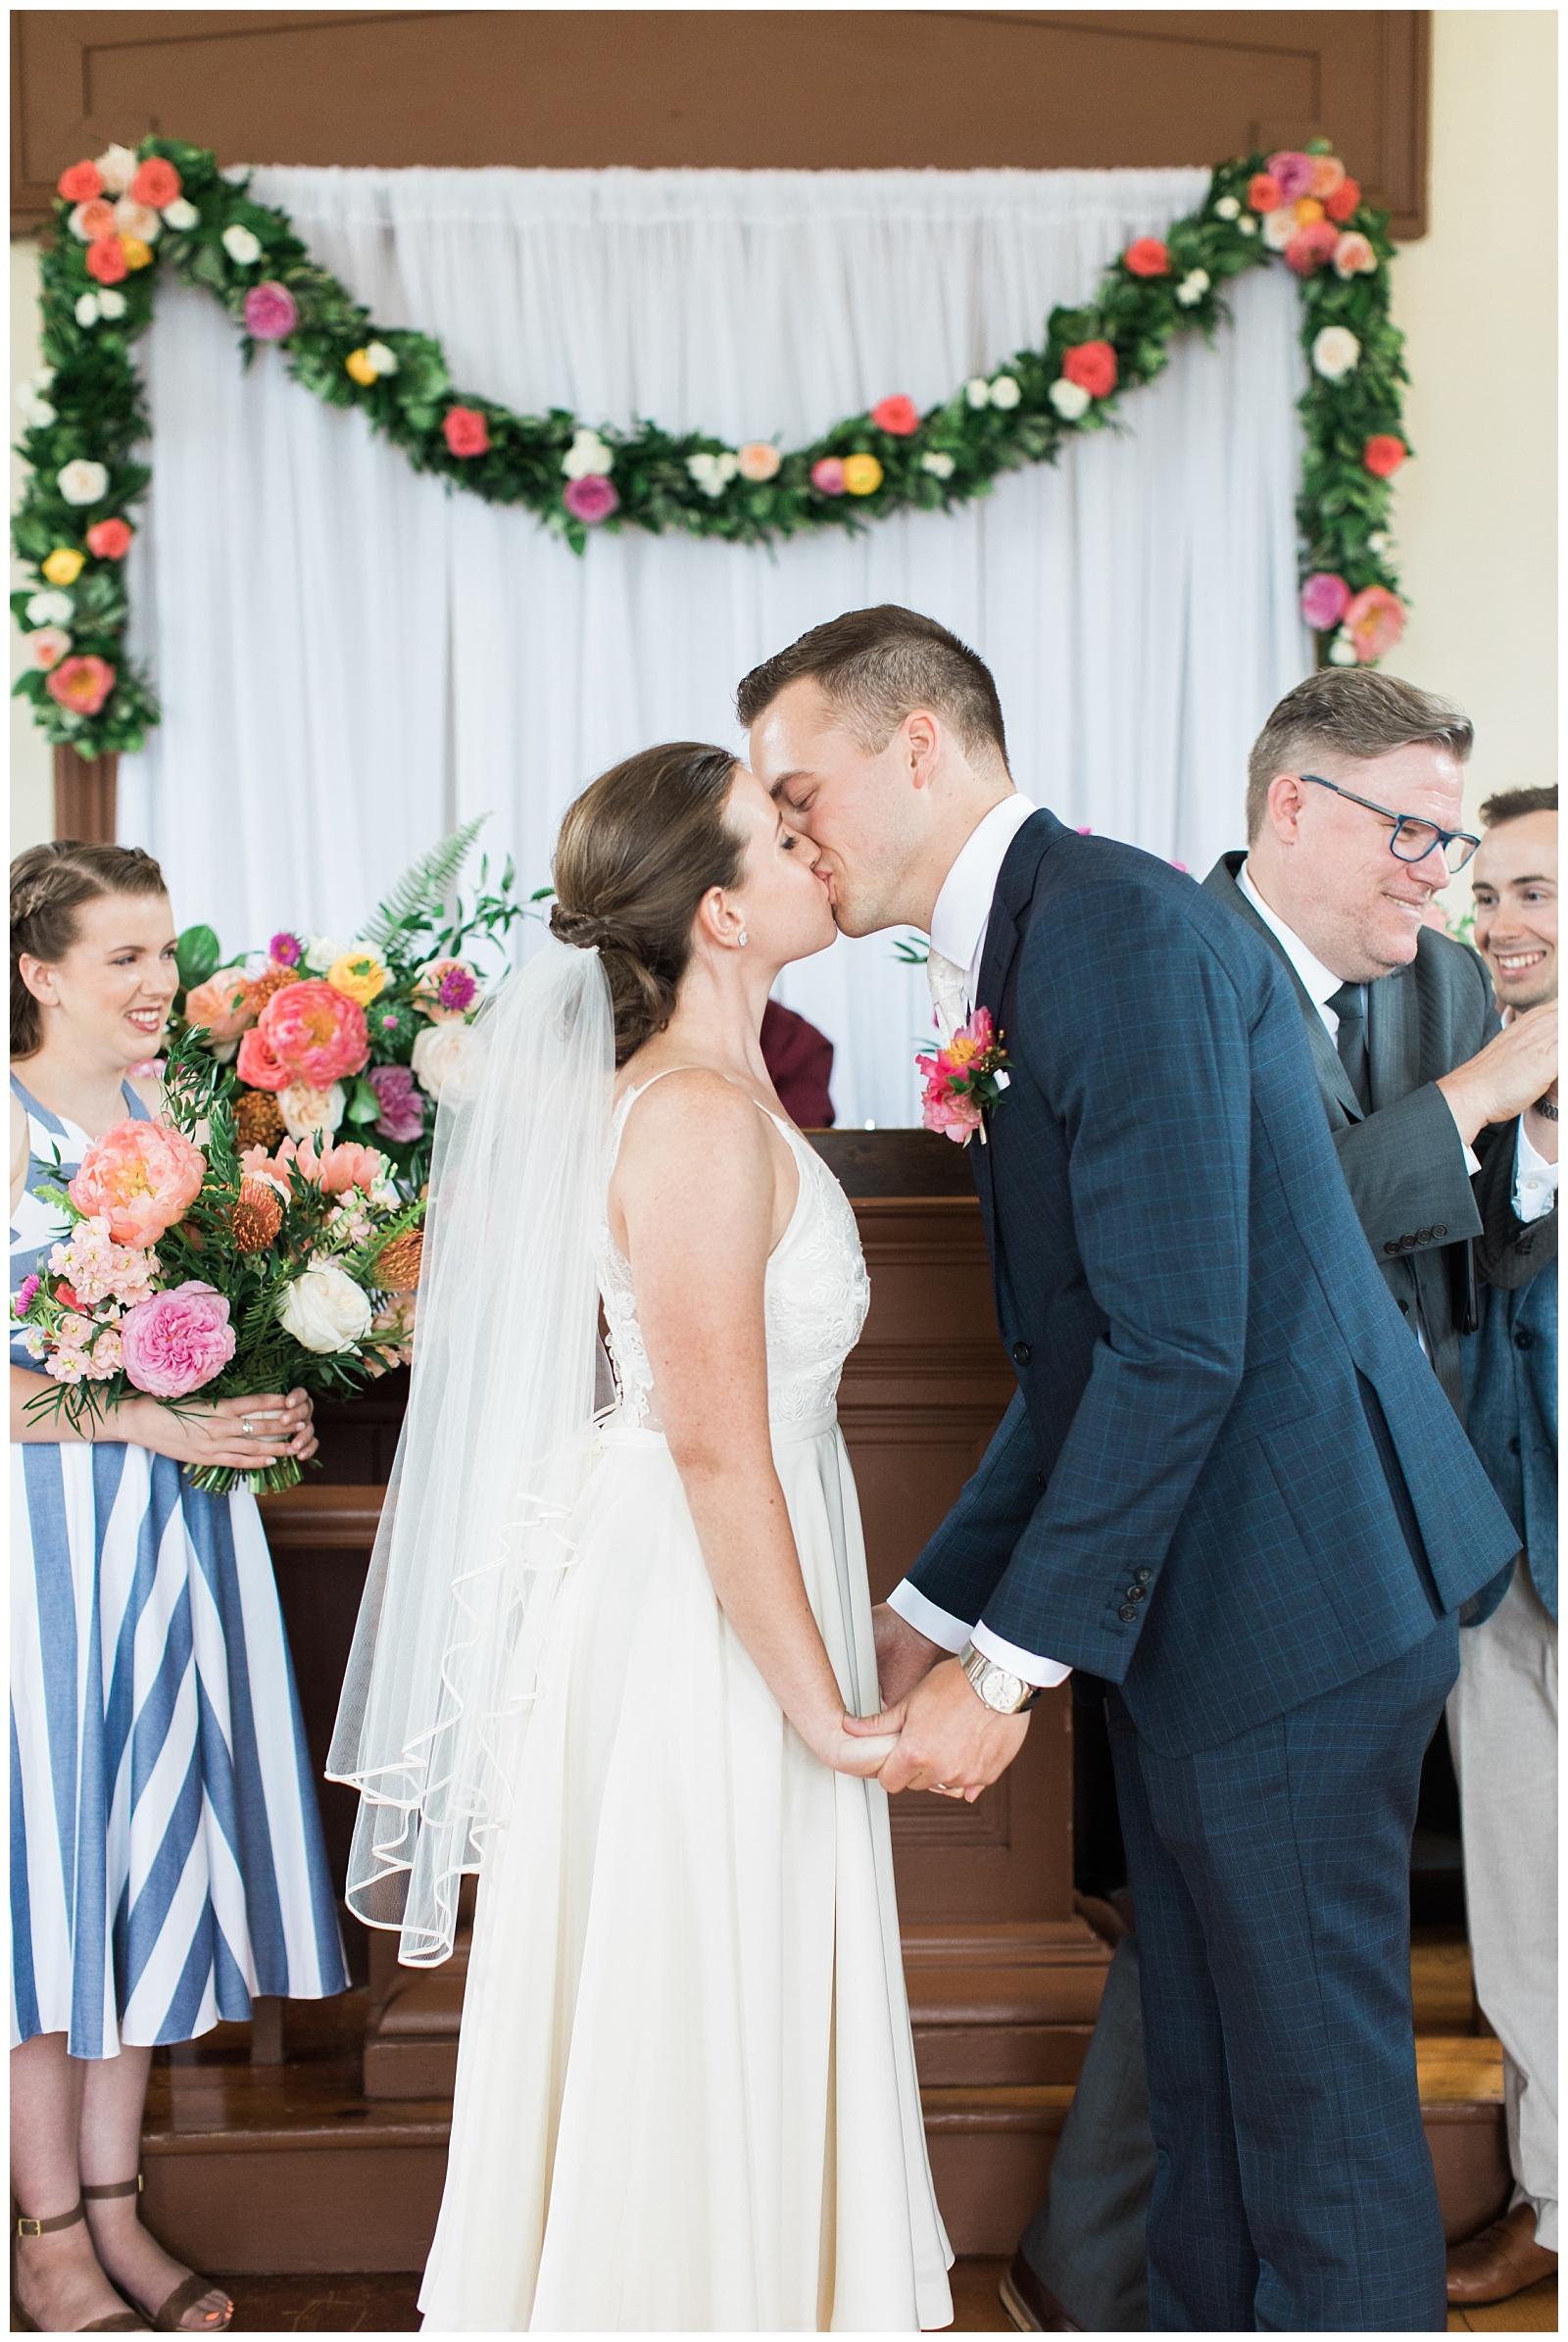 Bride and groom kiss at alter at Guelph Ontario Wedding | Ontario Wedding Photographer | Toronto Wedding Photographer | 3photography